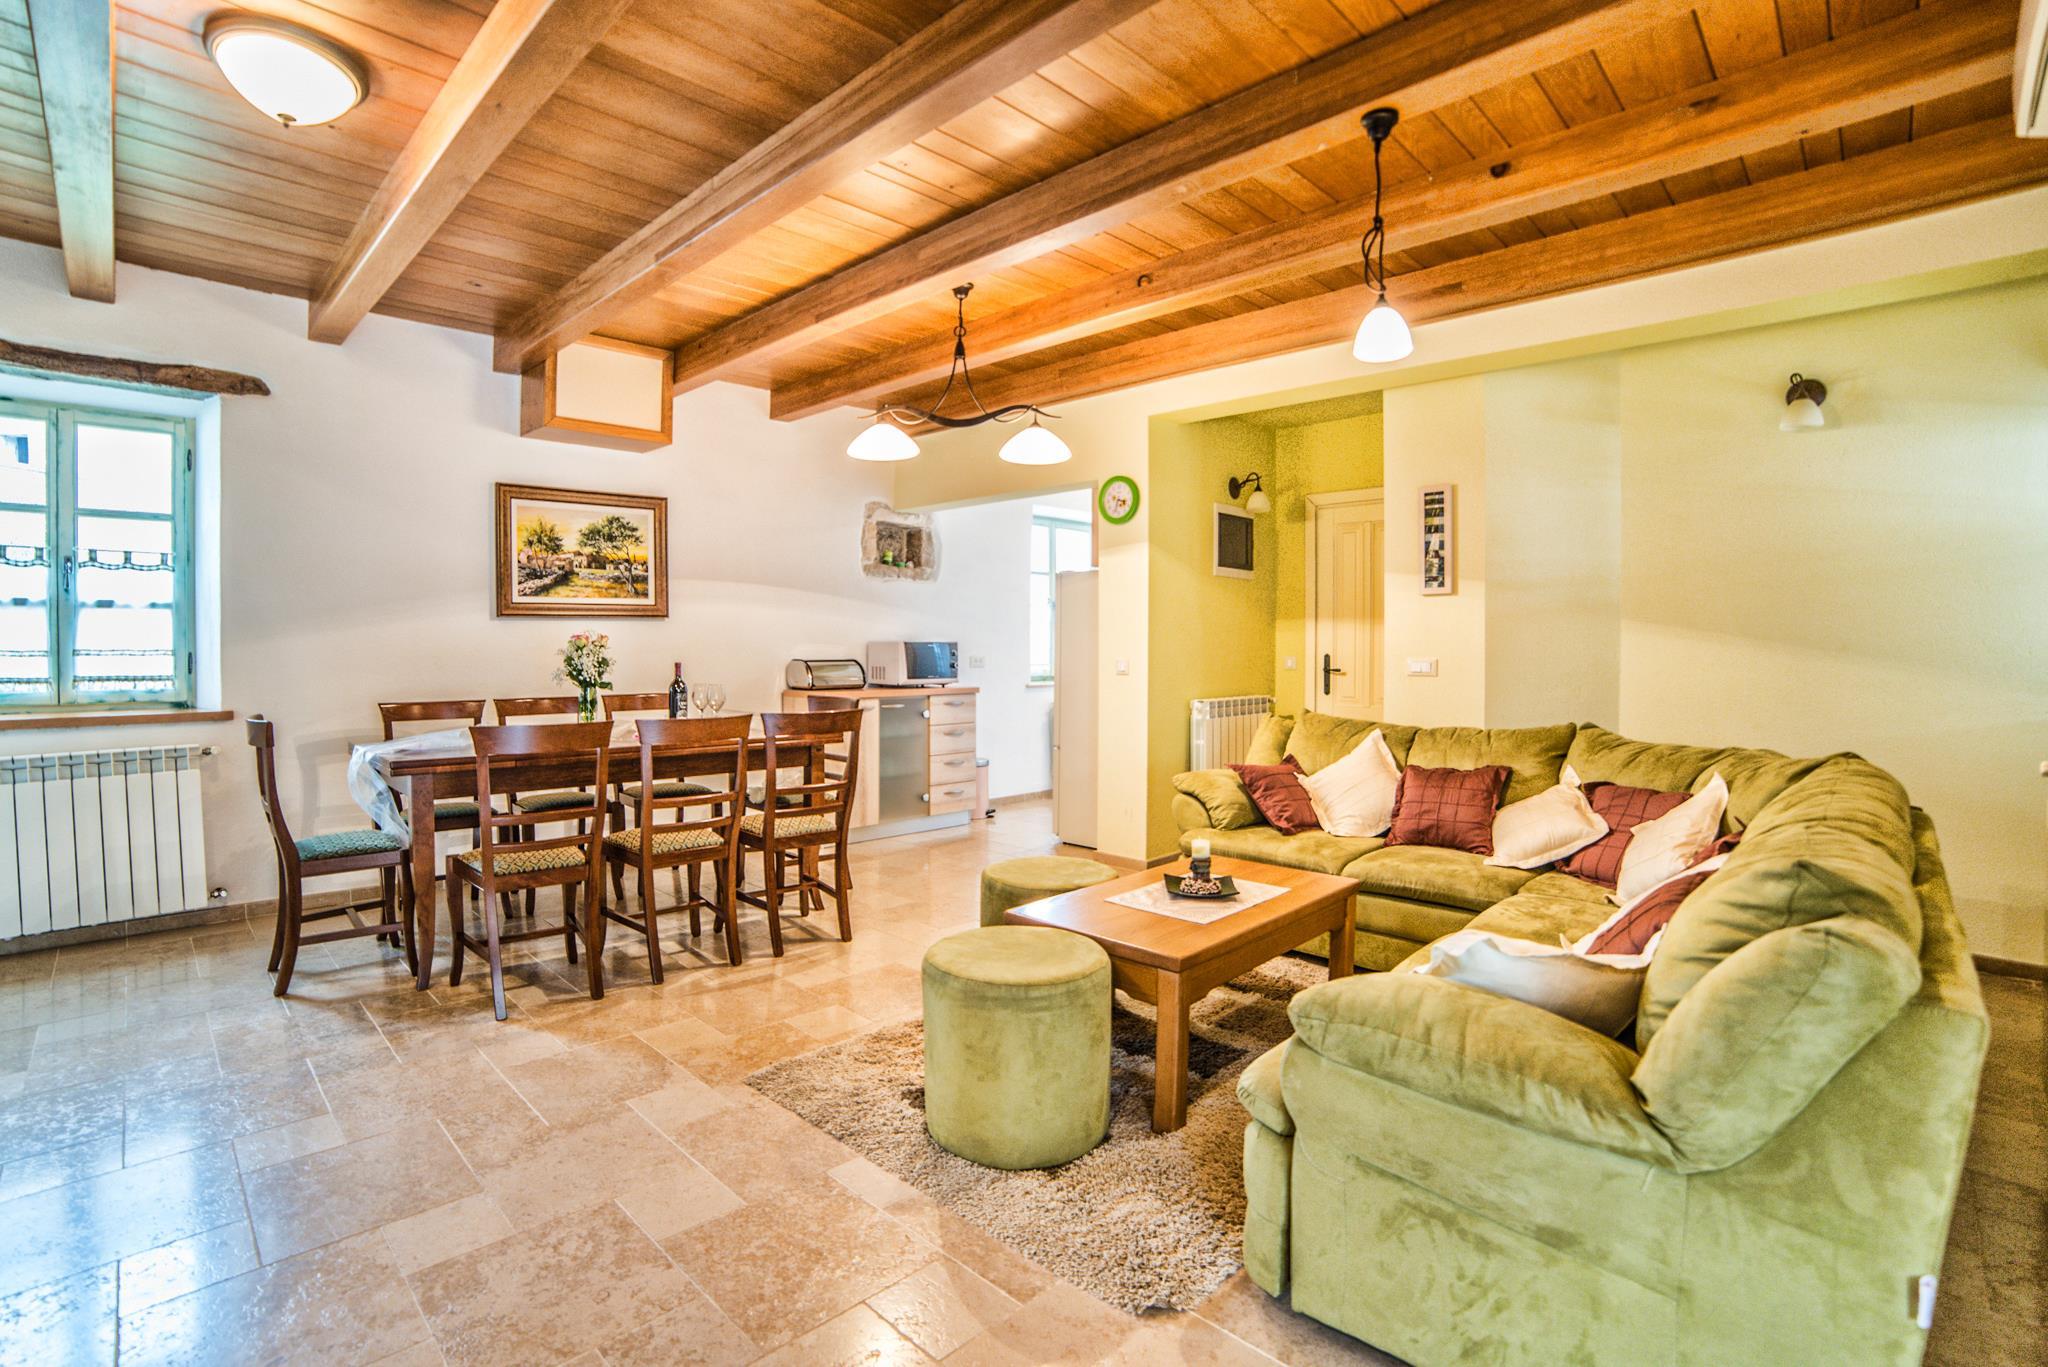 Ferienhaus Villa Bubani / private pool (860332), Kanfanar, , Istrien, Kroatien, Bild 15